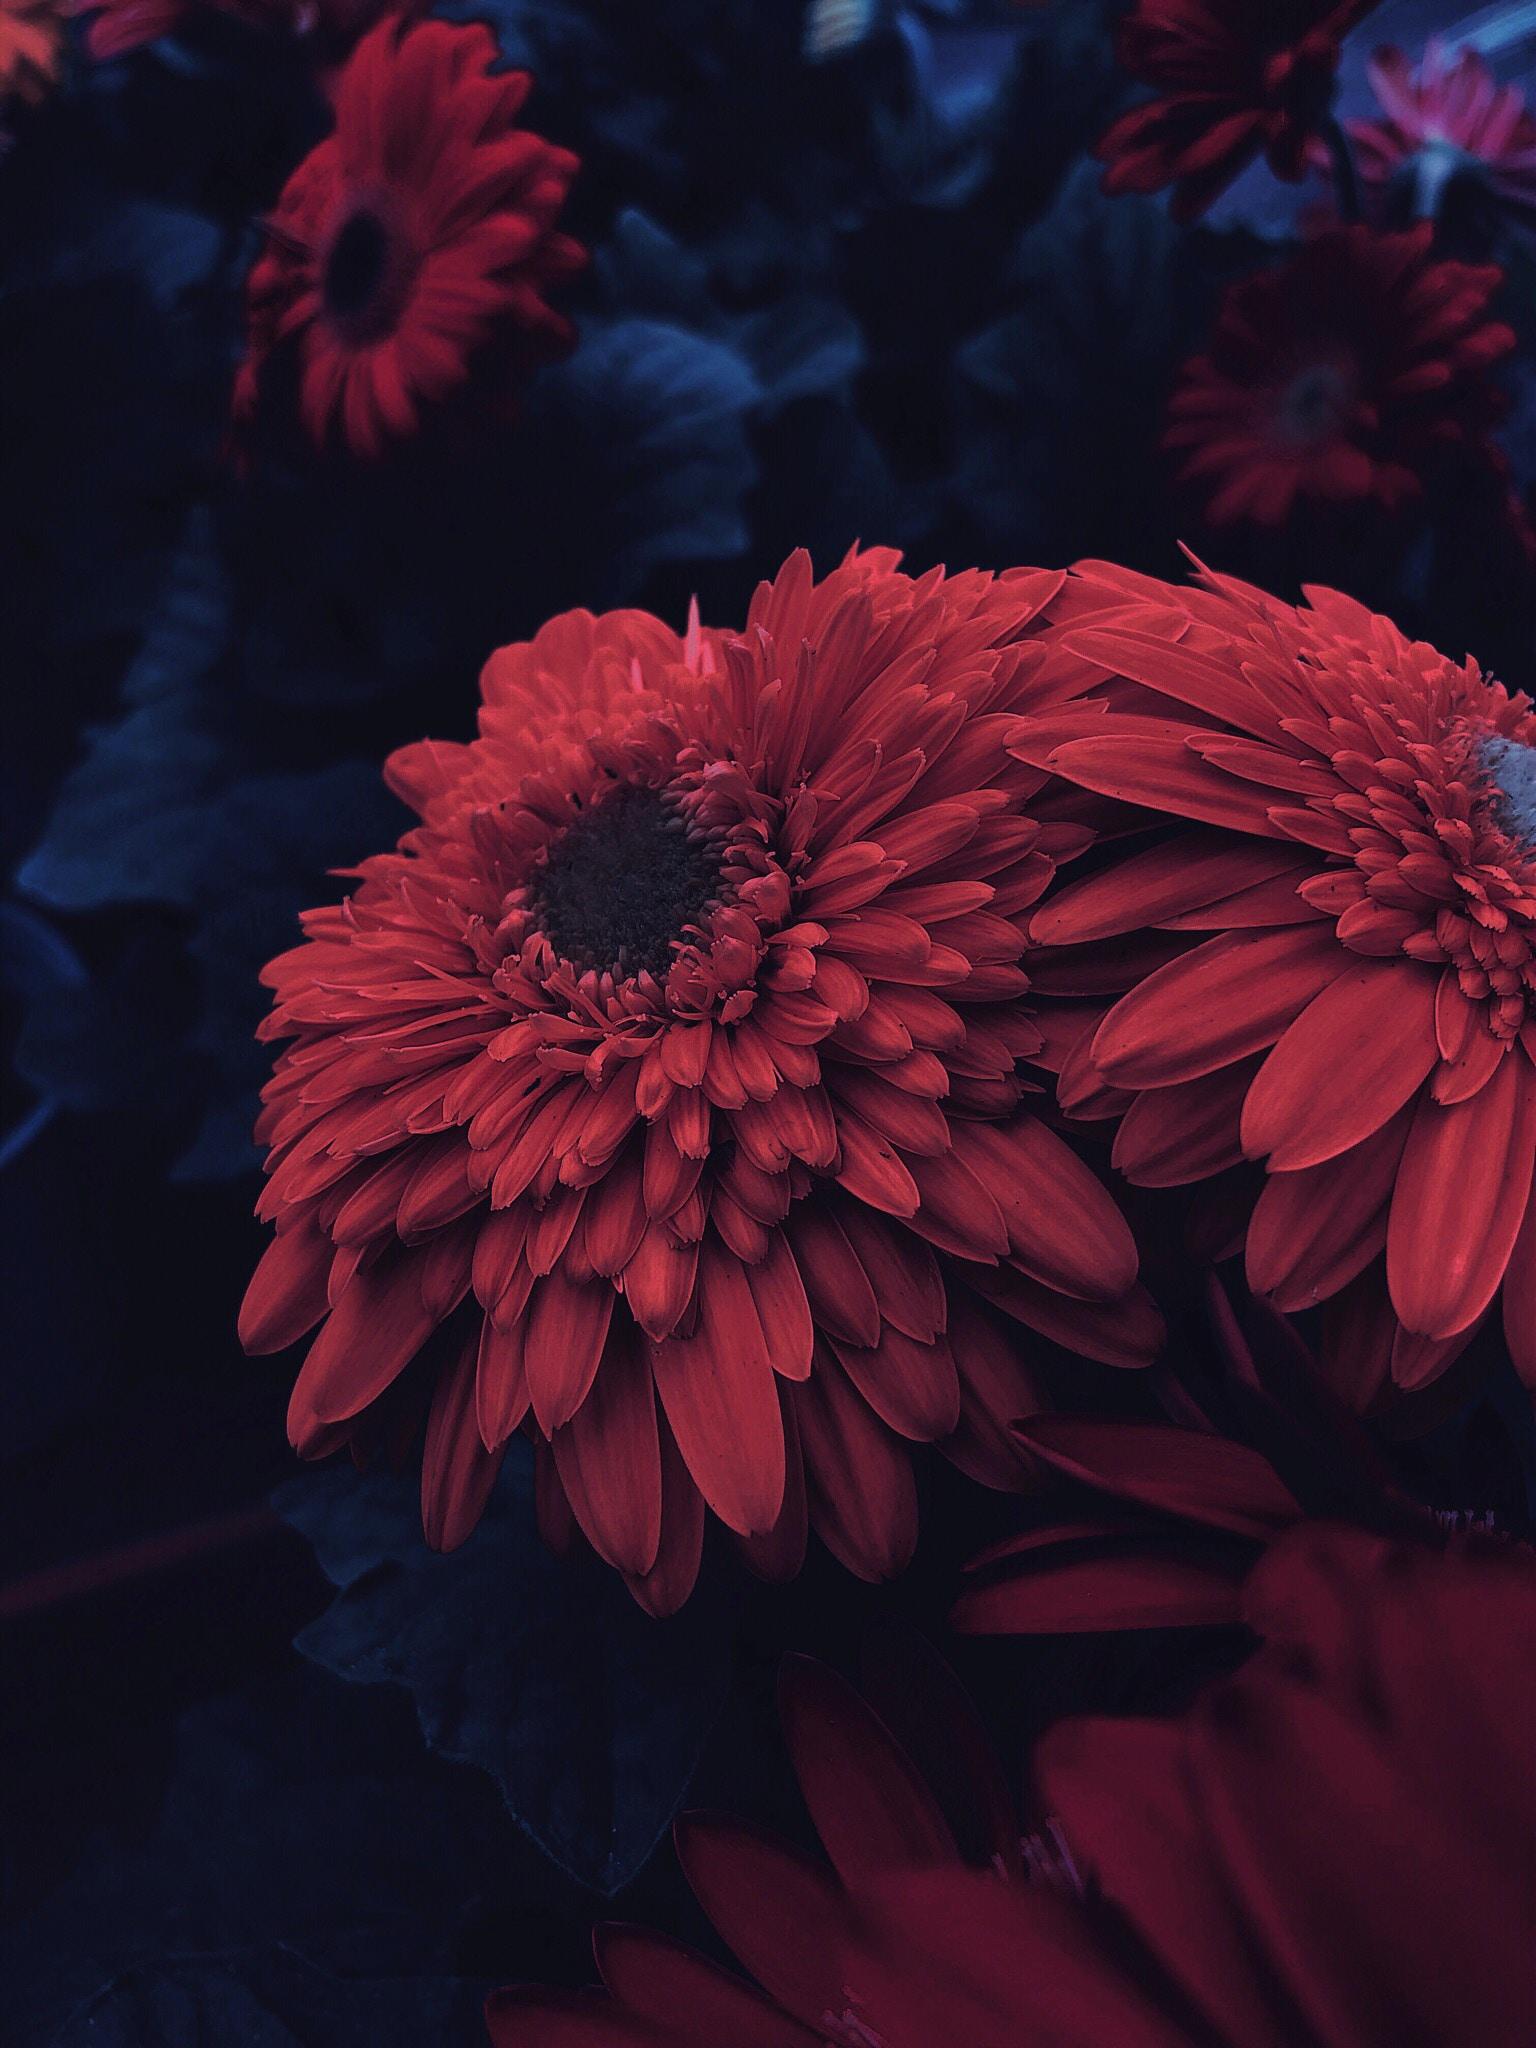 red petaled flowers